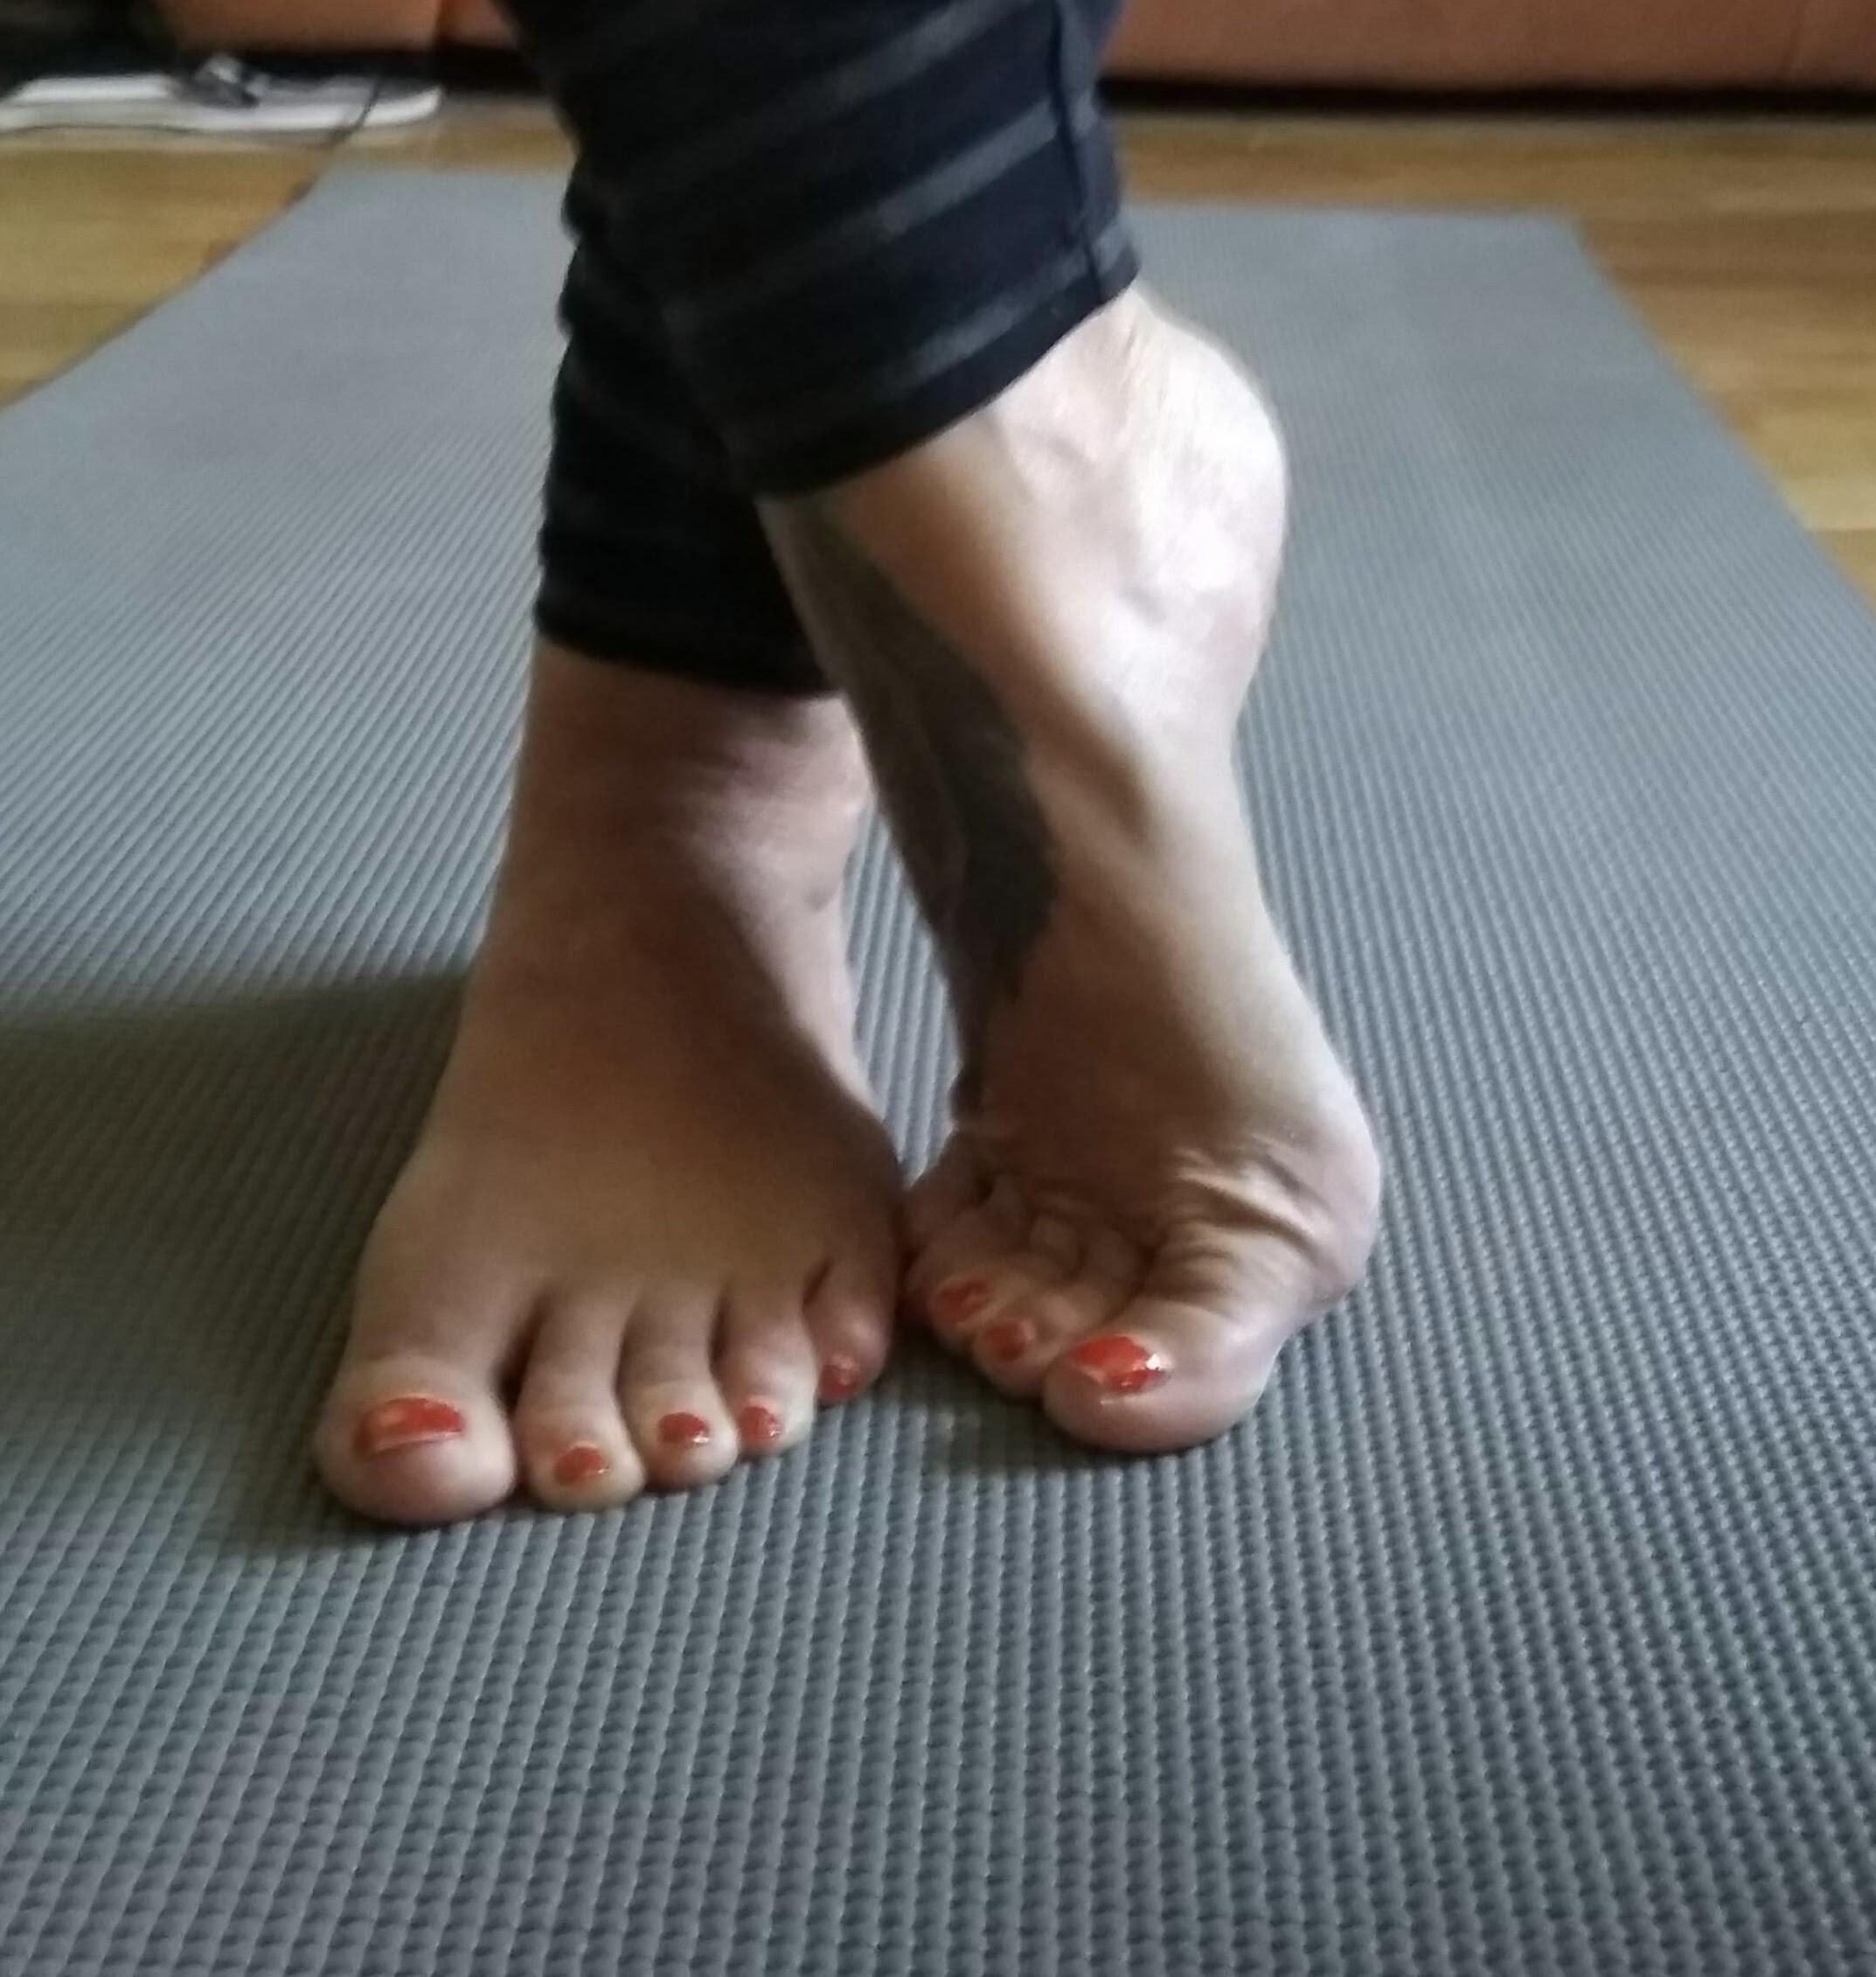 ¿Cuándo  te apuntaste a Pilates… pensaste en tus pies?